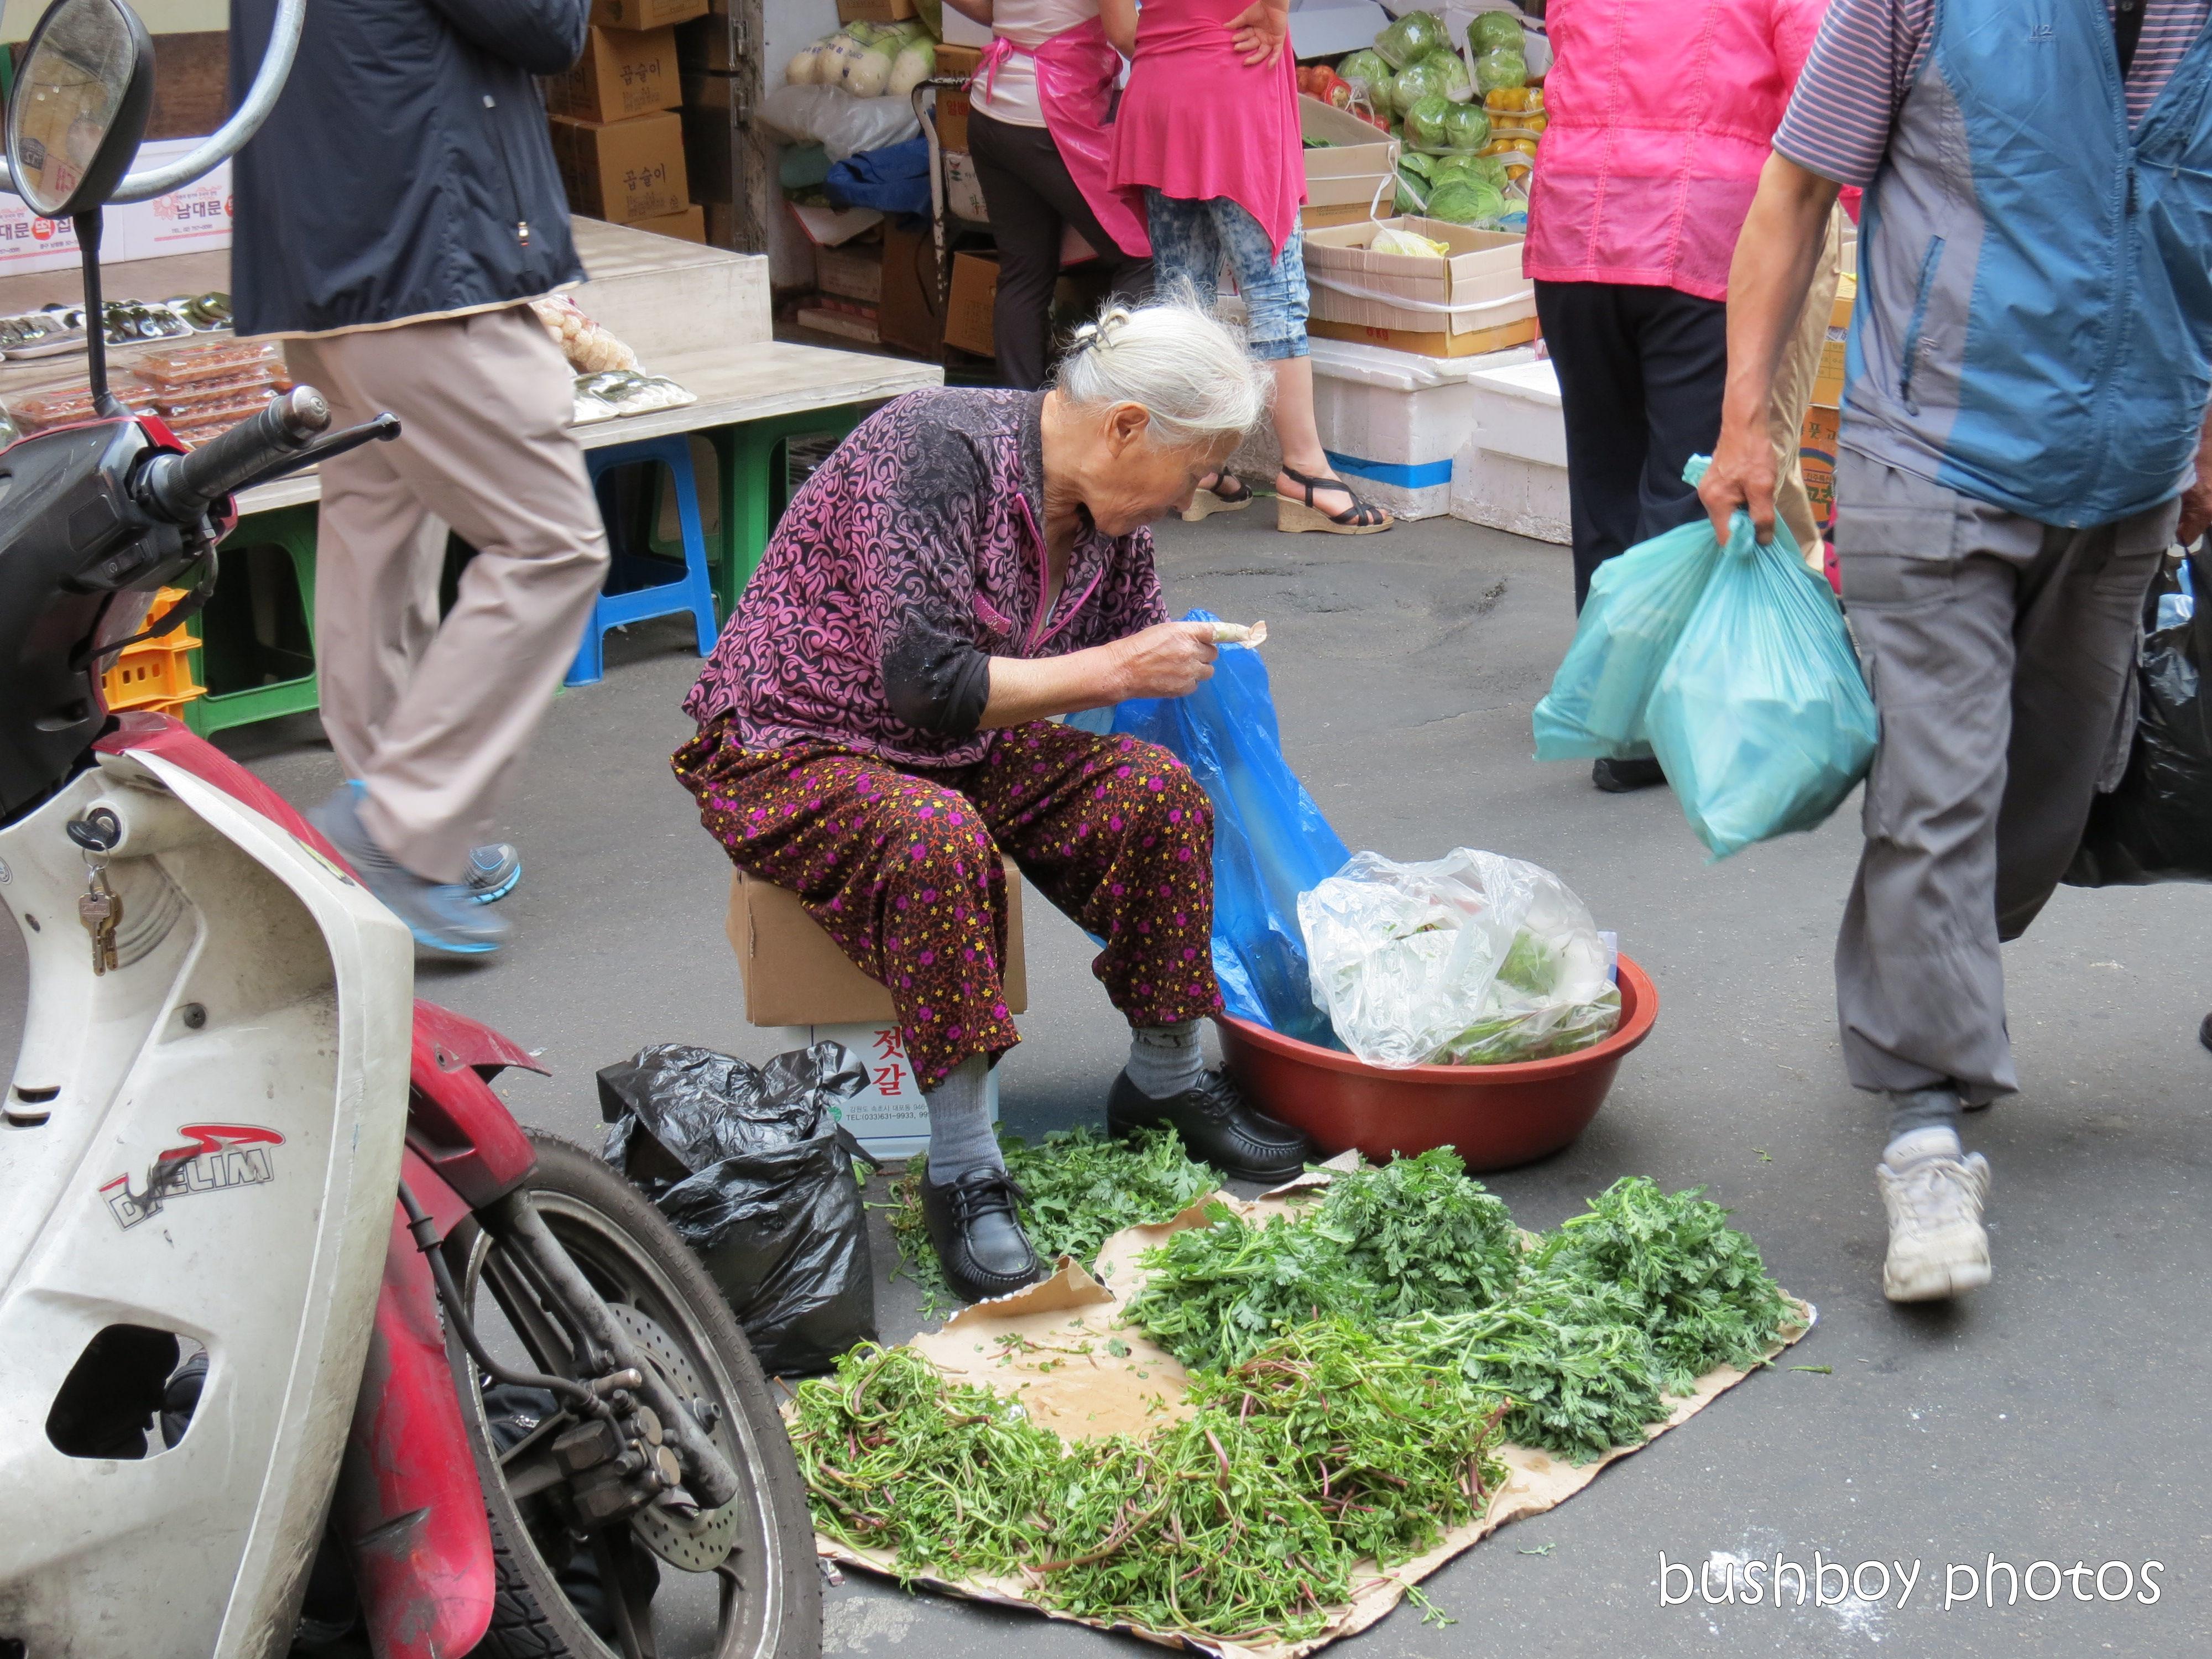 180828_blog challenge-shopping_seoul4